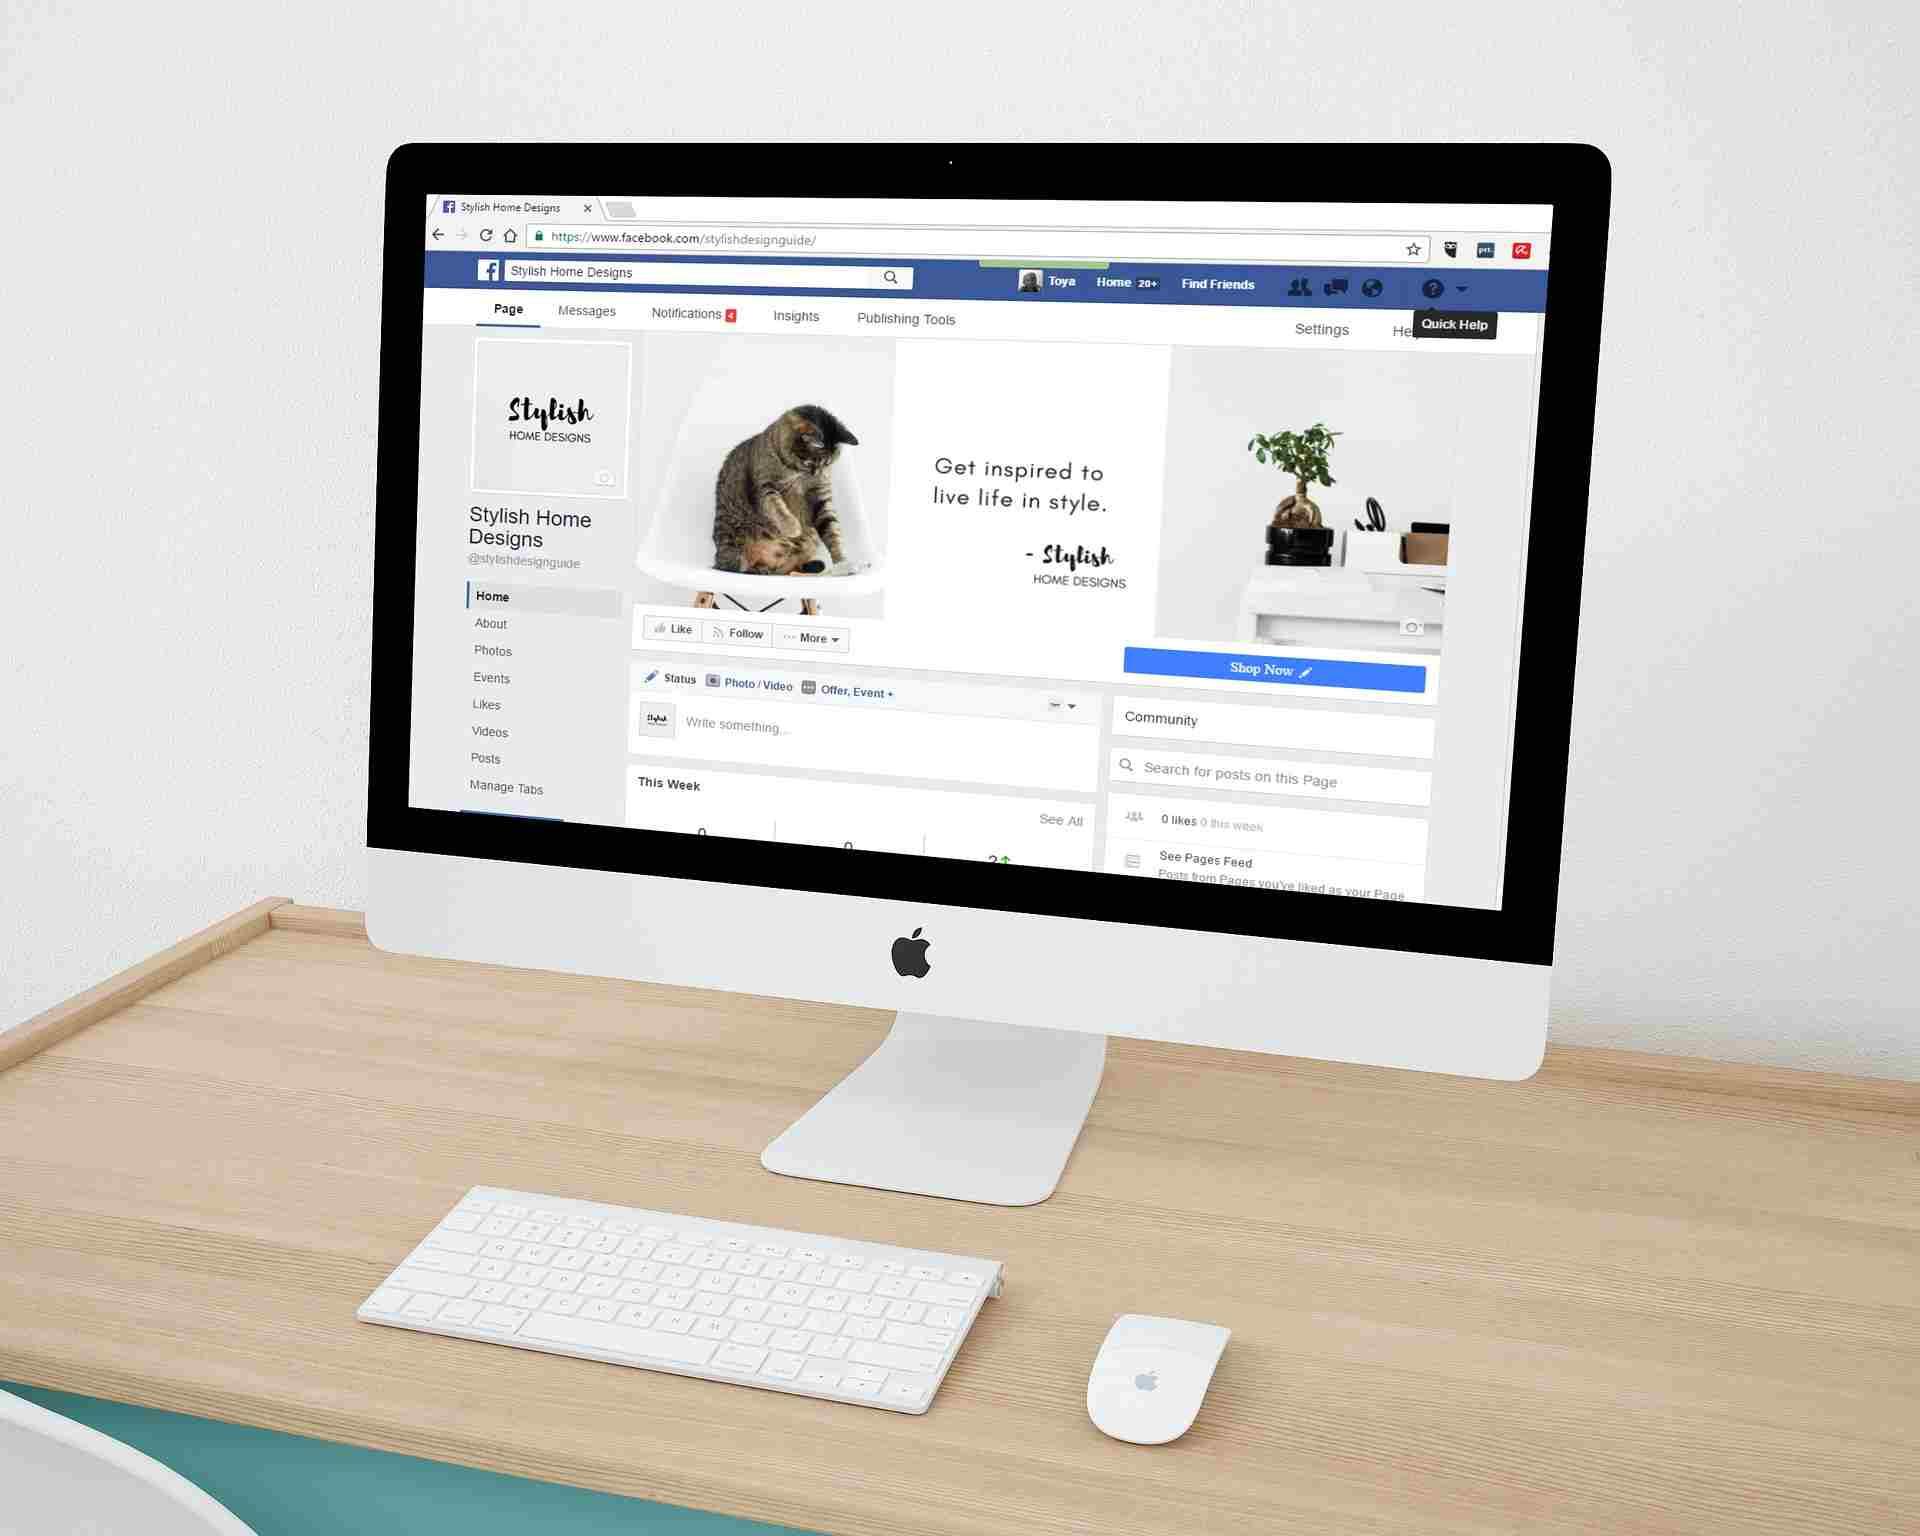 Sarbd Facebook Marketing